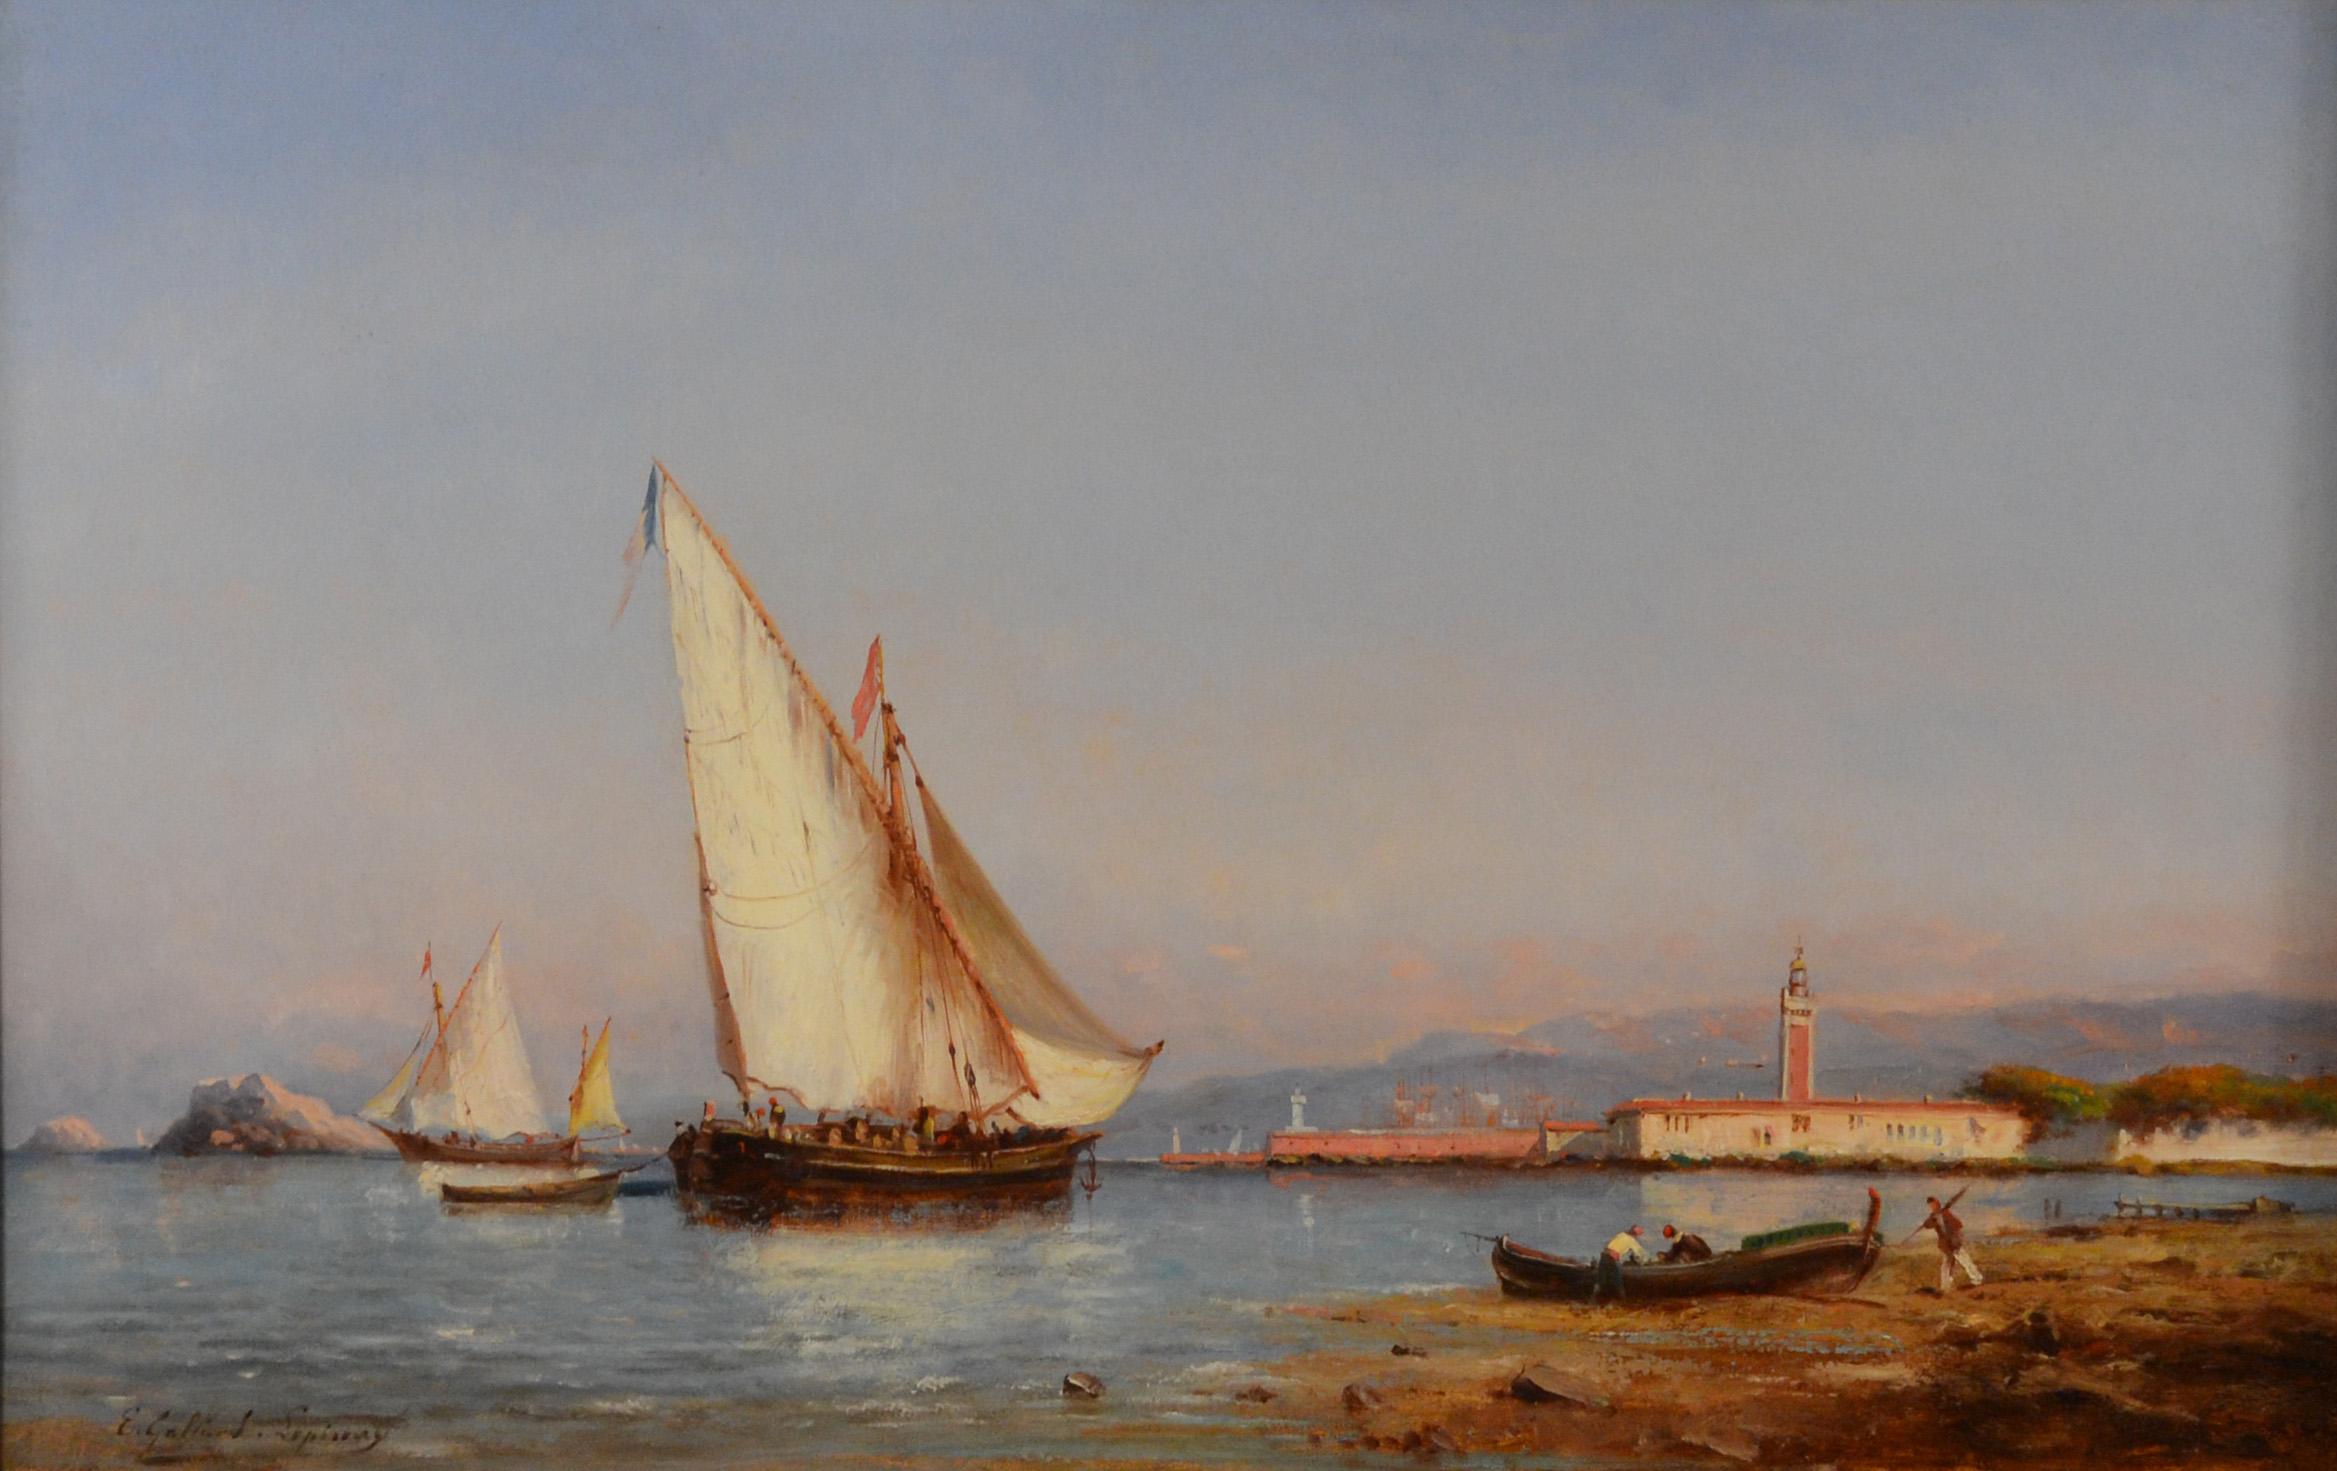 Paul Charles Emmanuel Gallard-Lepinay